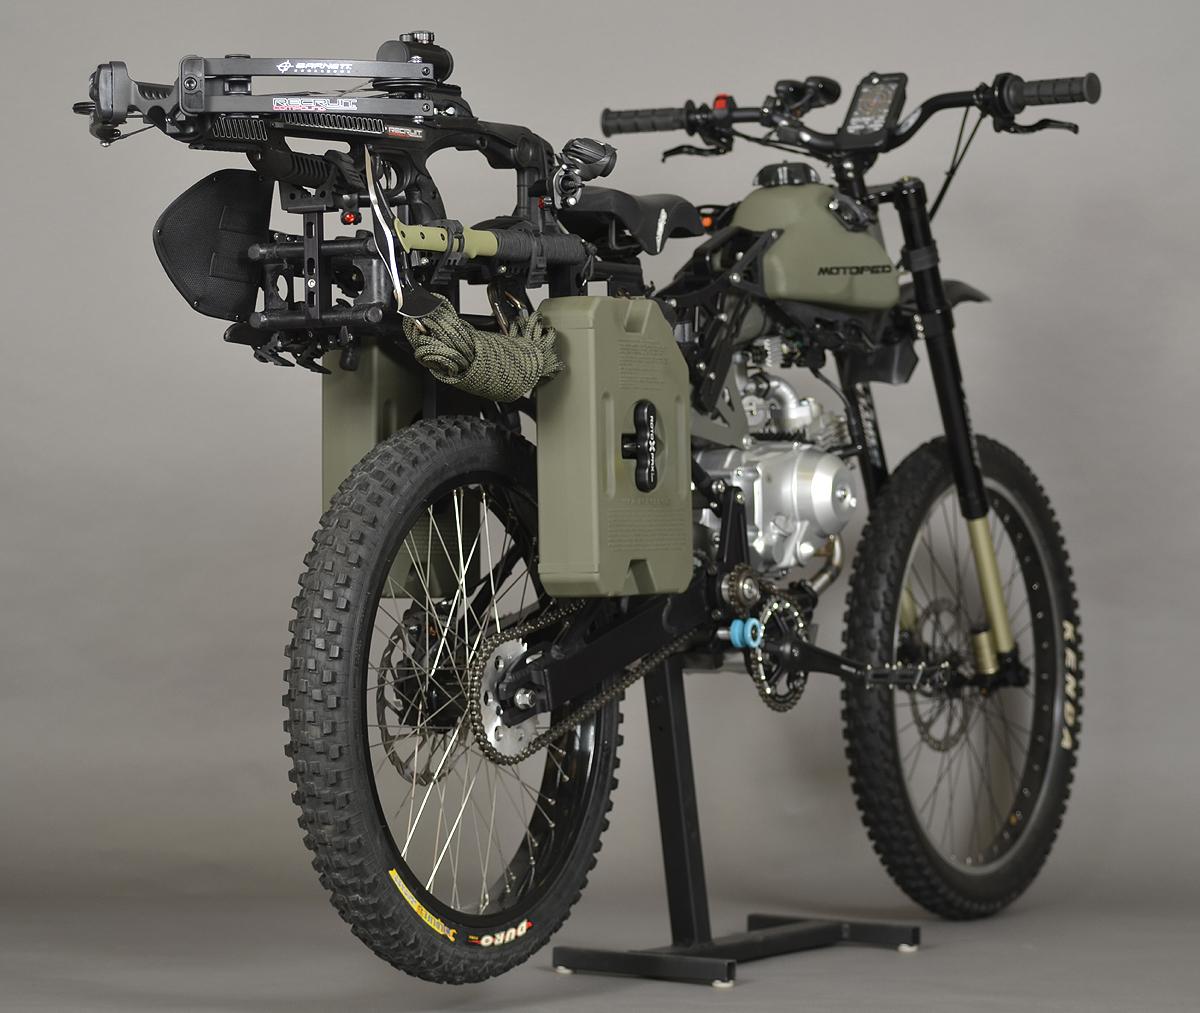 back side of motoped